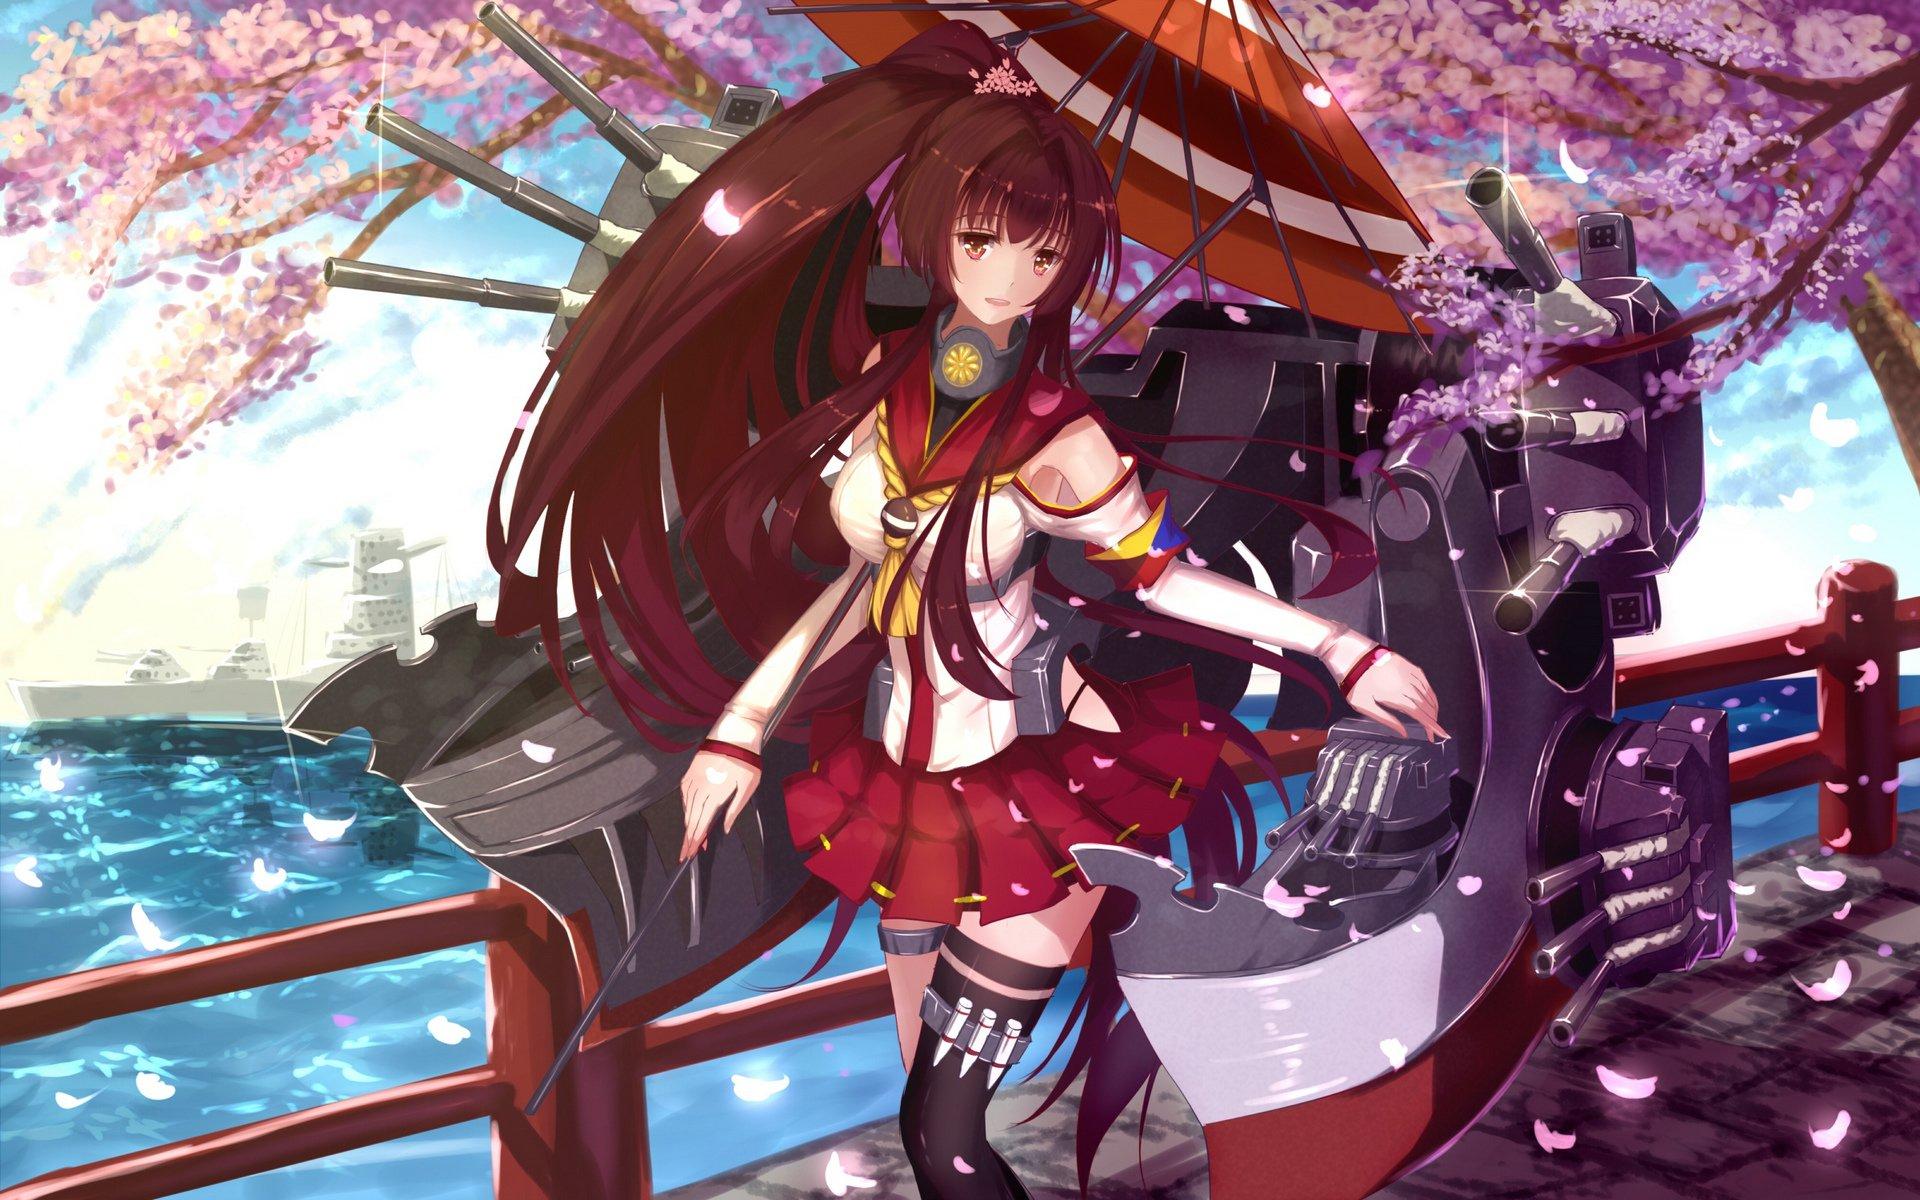 Anime - Kantai Collection  Anime Long Hair Brown Hair Brown Eyes Sakura Blossom Weapon Skirt Yamato (Kancolle) Wallpaper